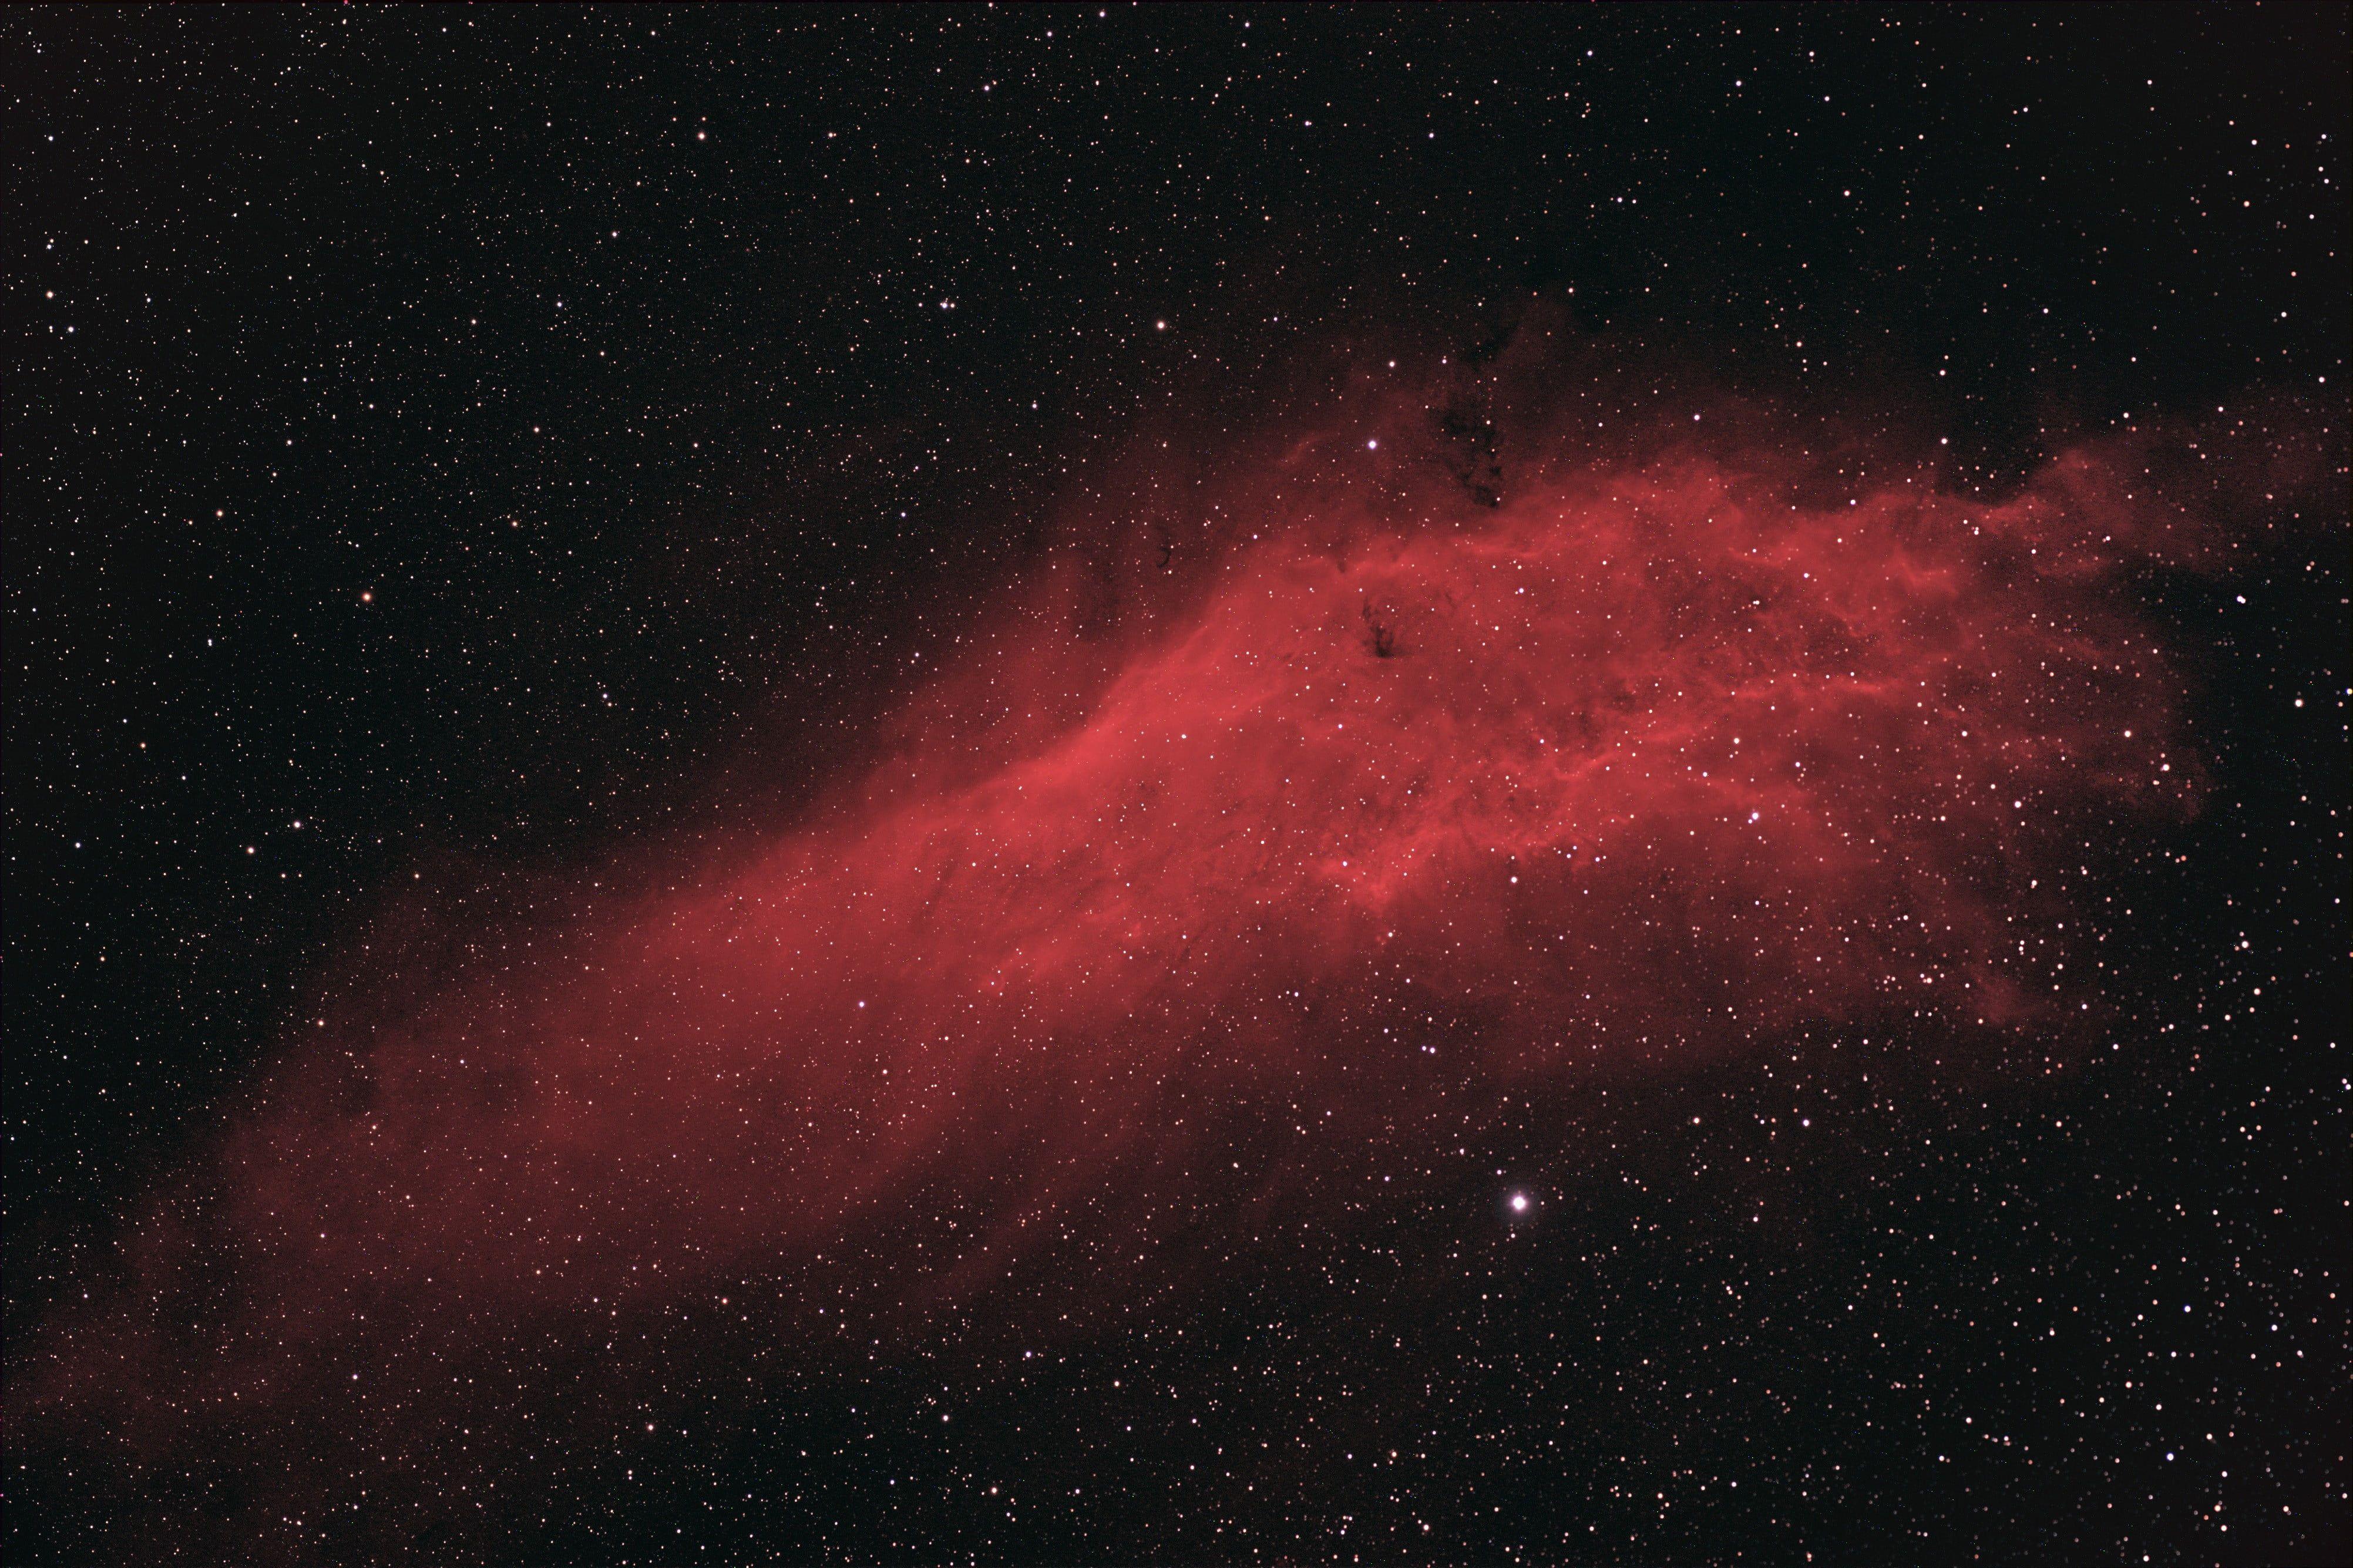 red nebula #space #galaxy #stars space art digital art #4K #wallpaper #hdwallpaper #desktop